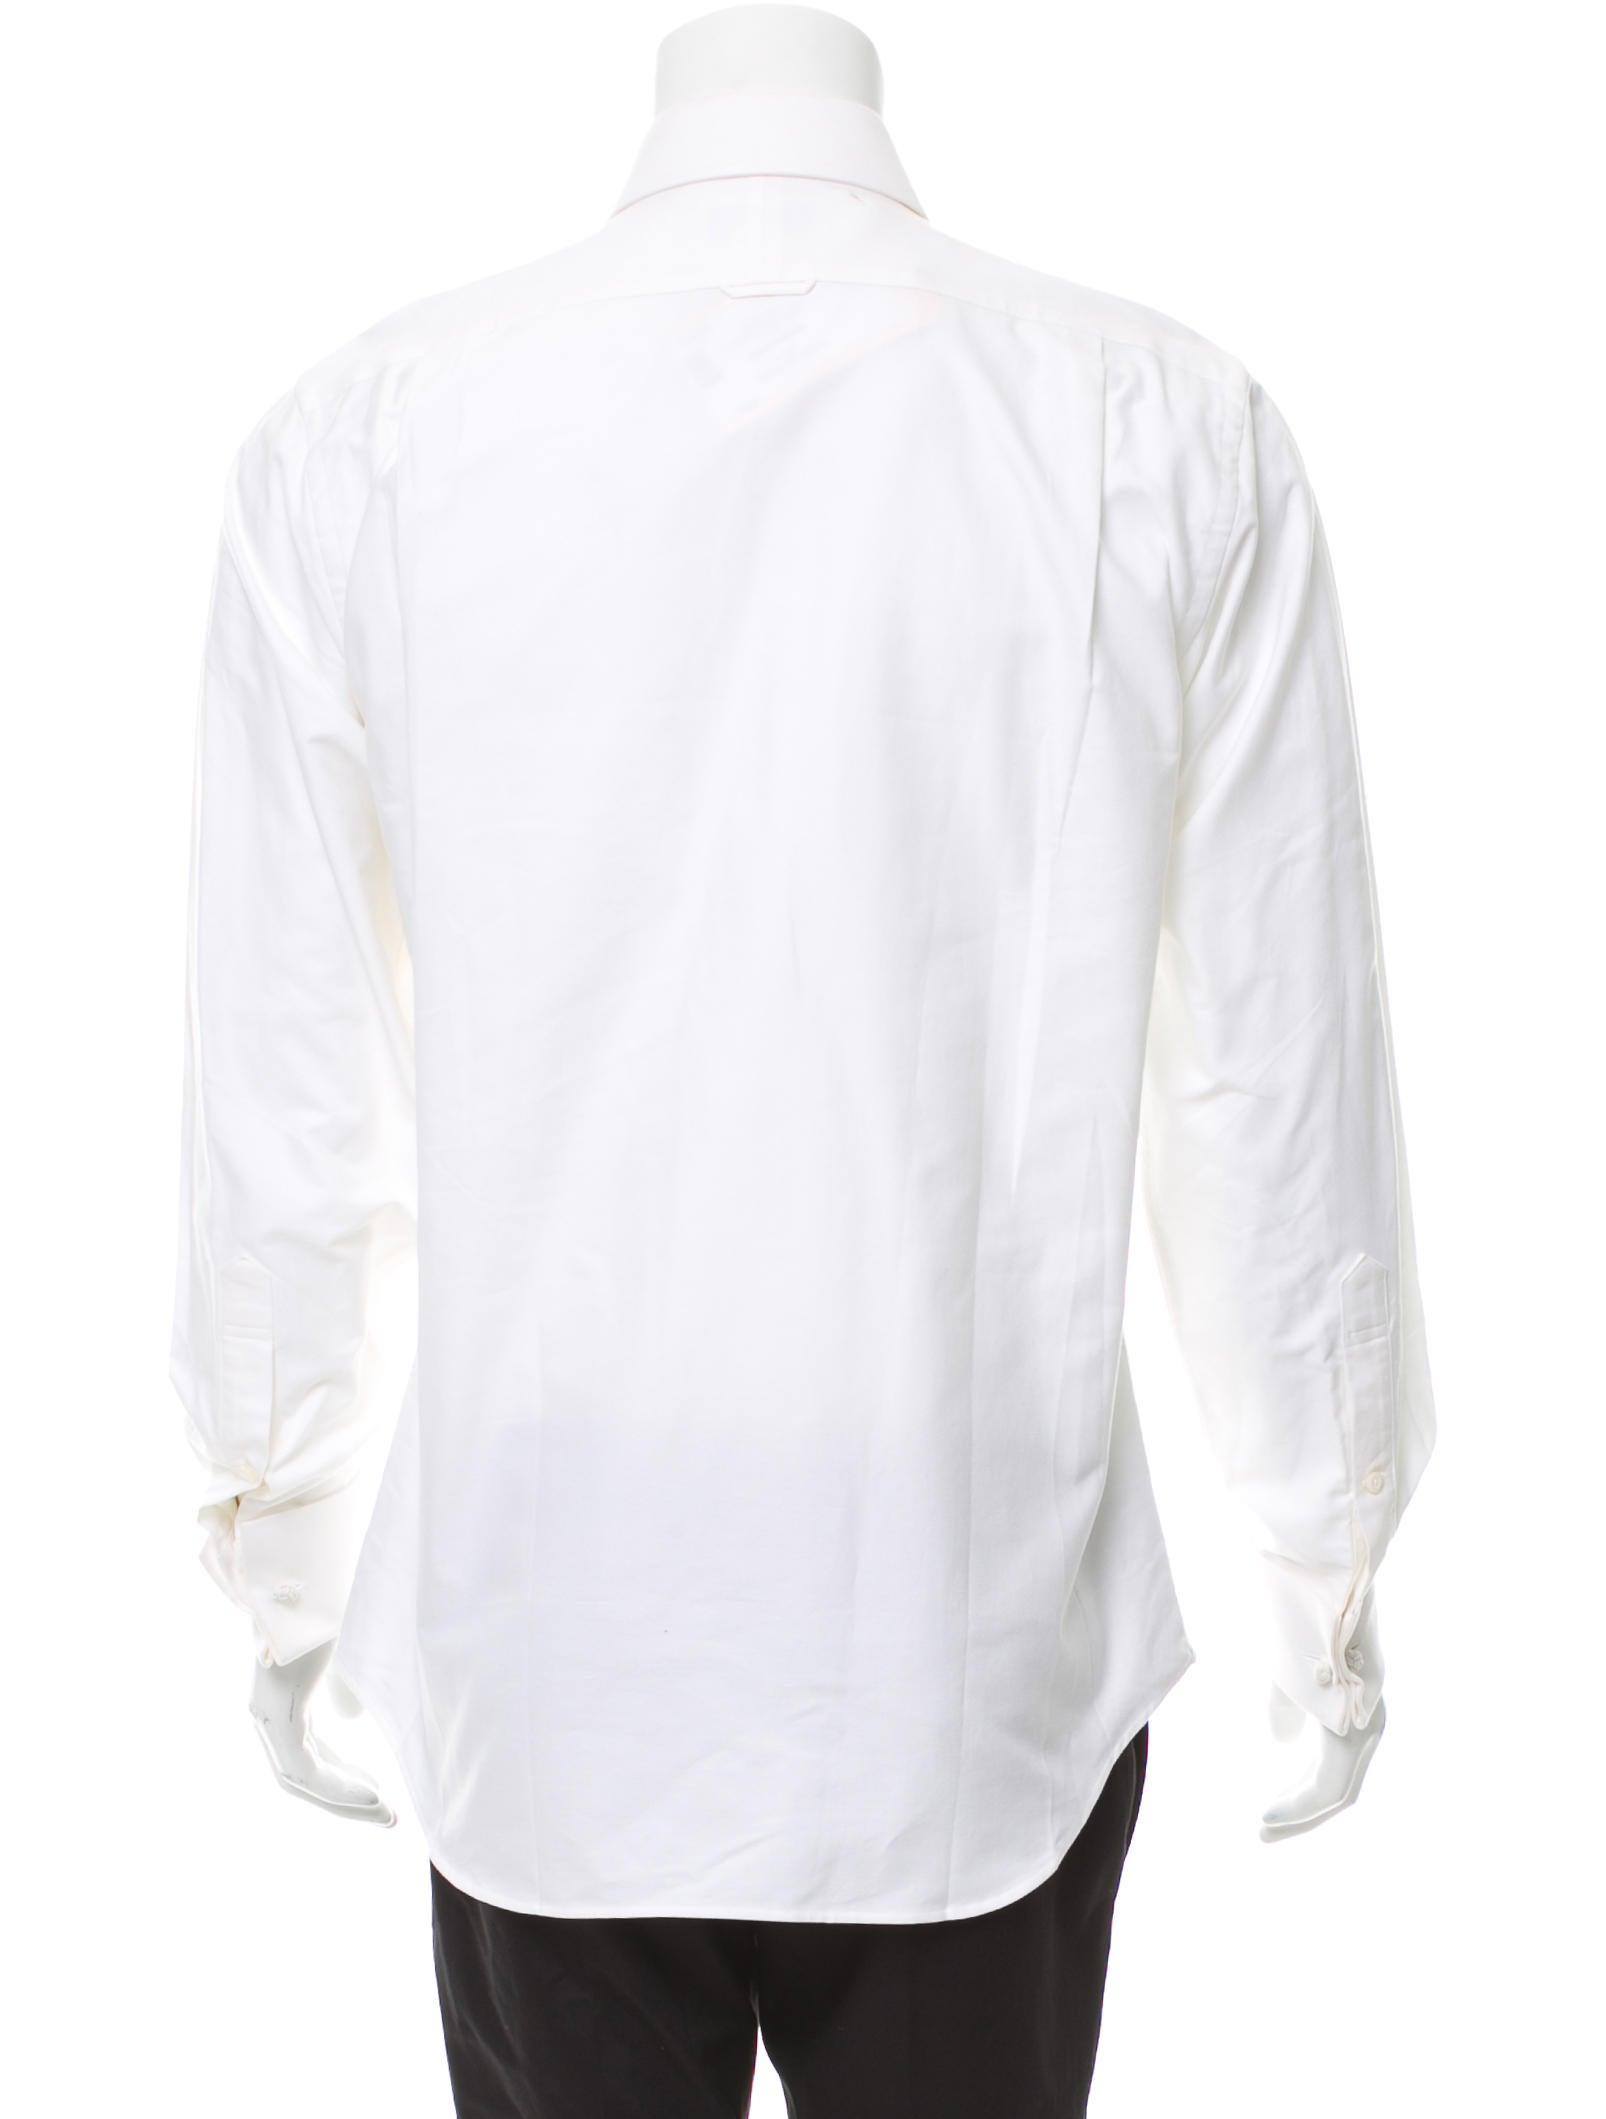 Thom browne french cuff tuxedo shirt clothing tho22069 for Tuxedo shirt french cuff